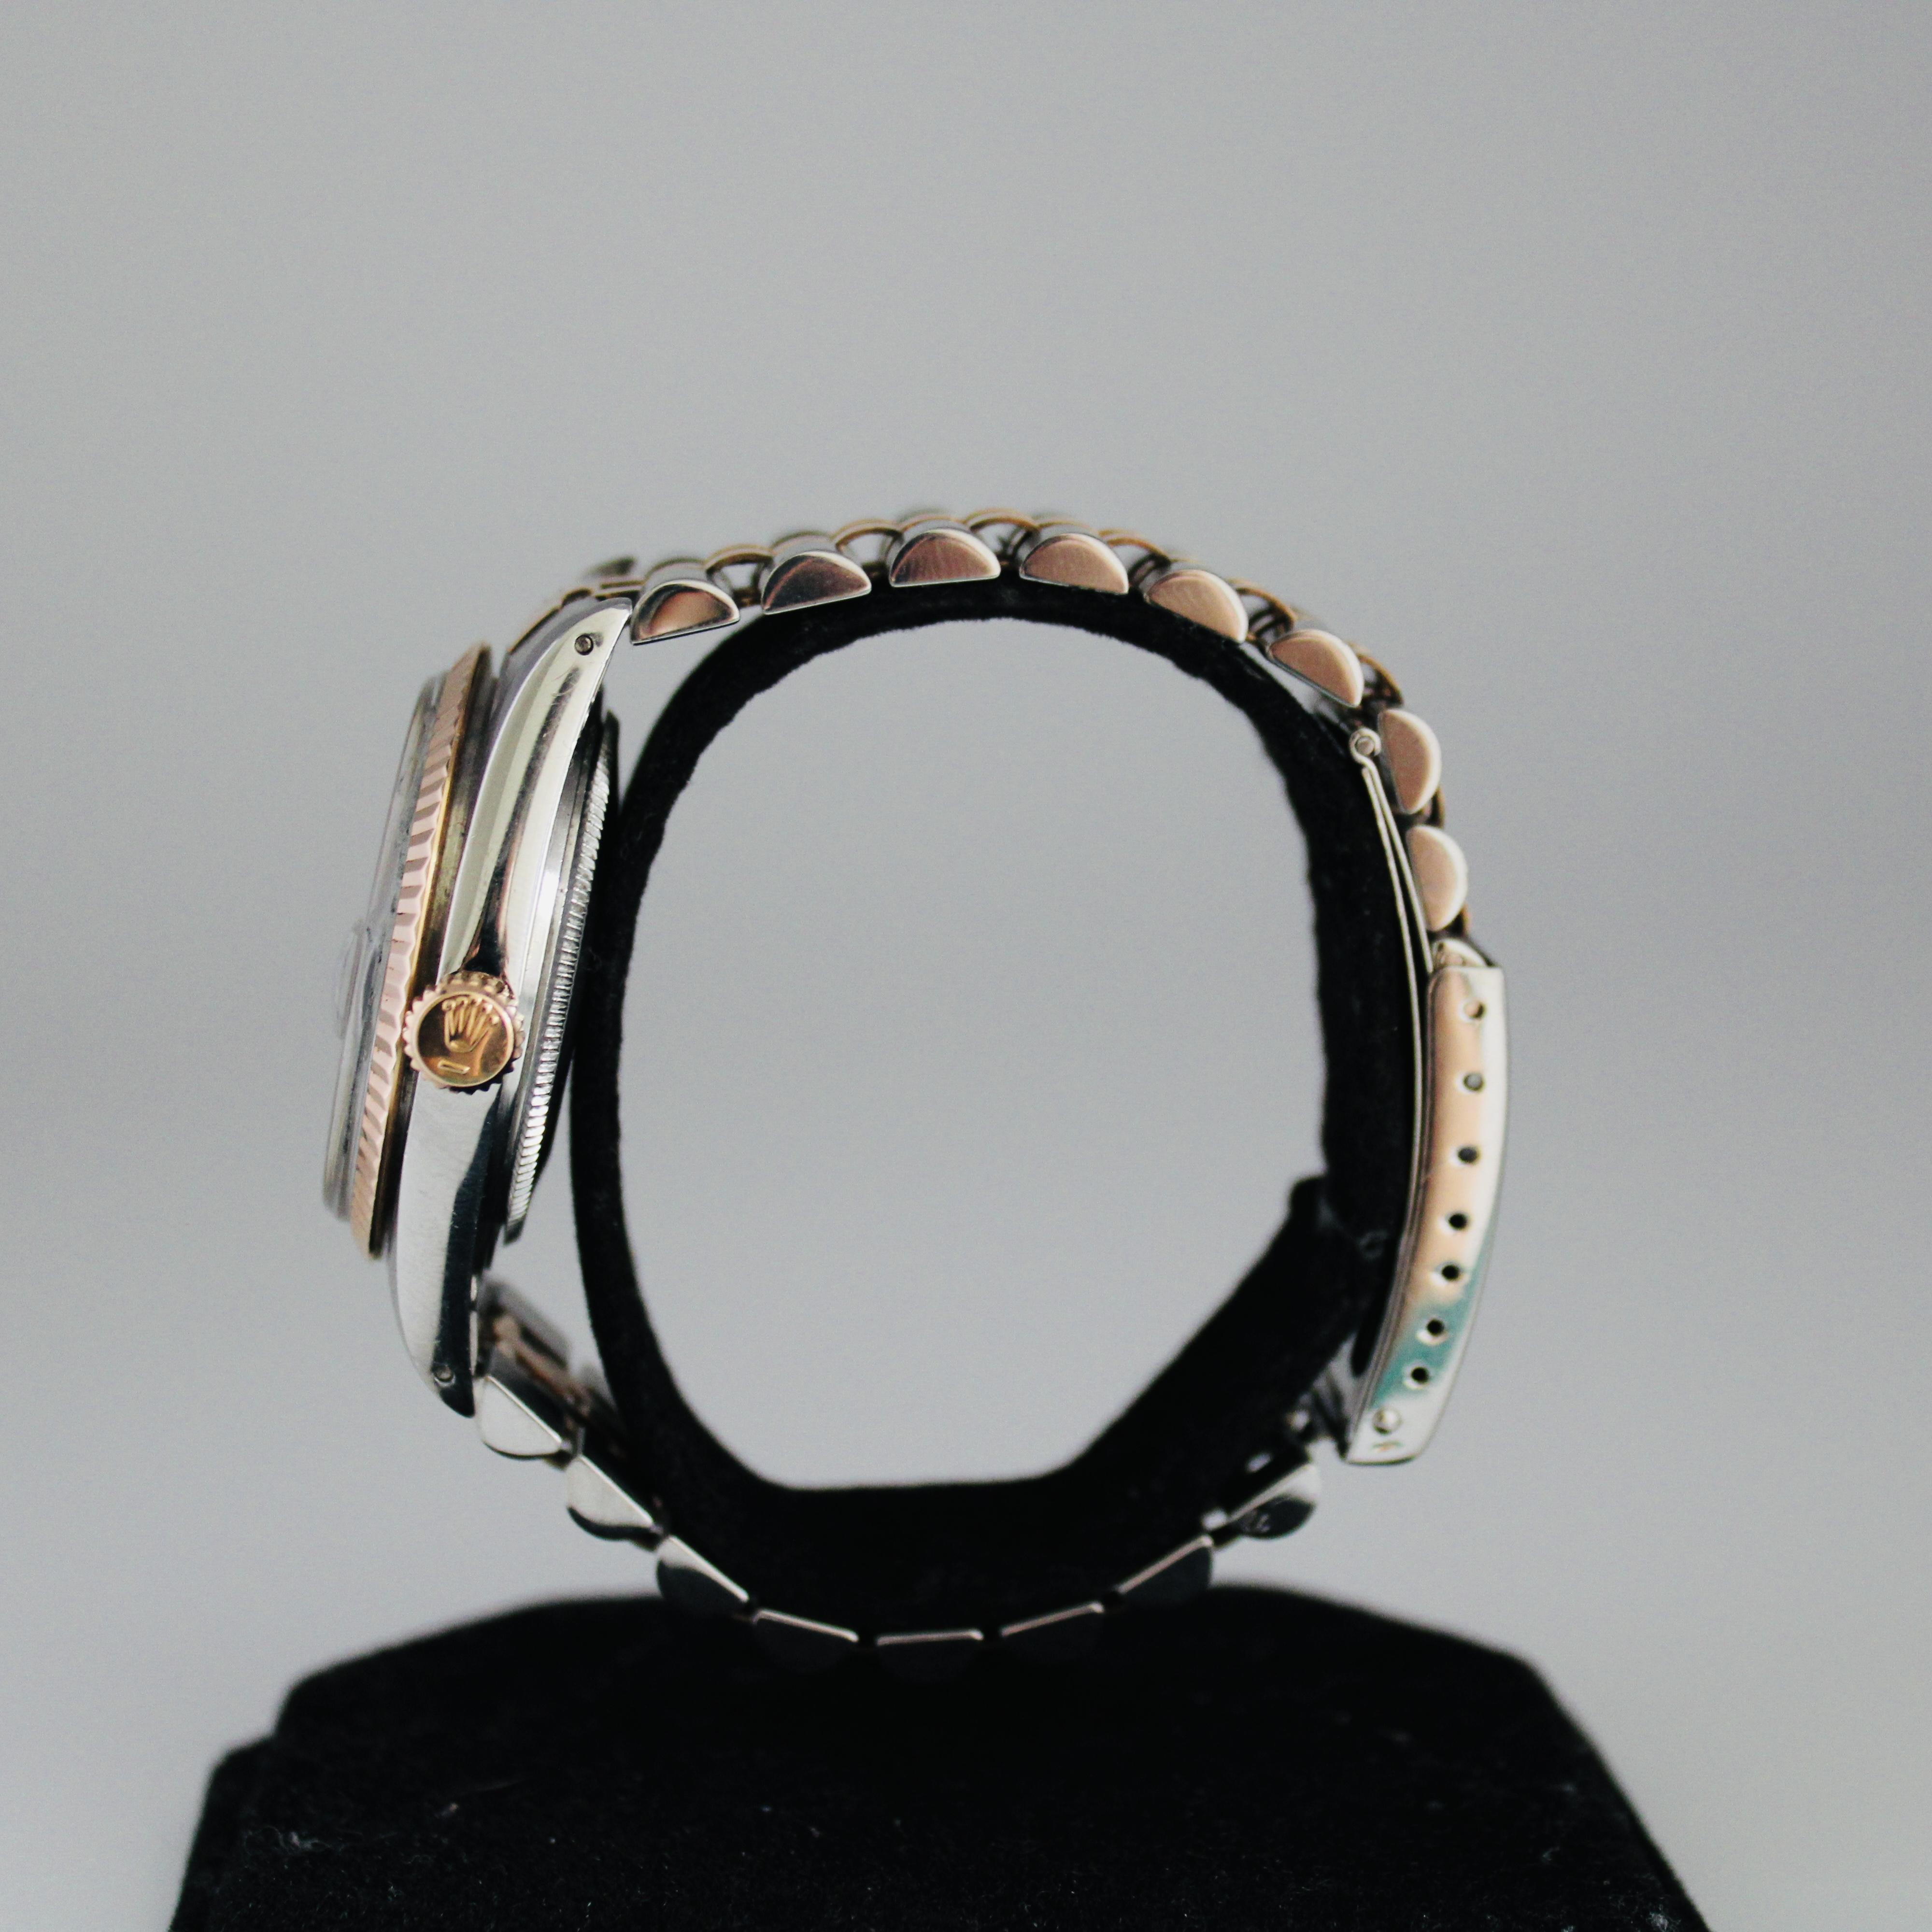 Rolex Datejust ref 1601 Steel & Pink Gold - Image 3 of 8